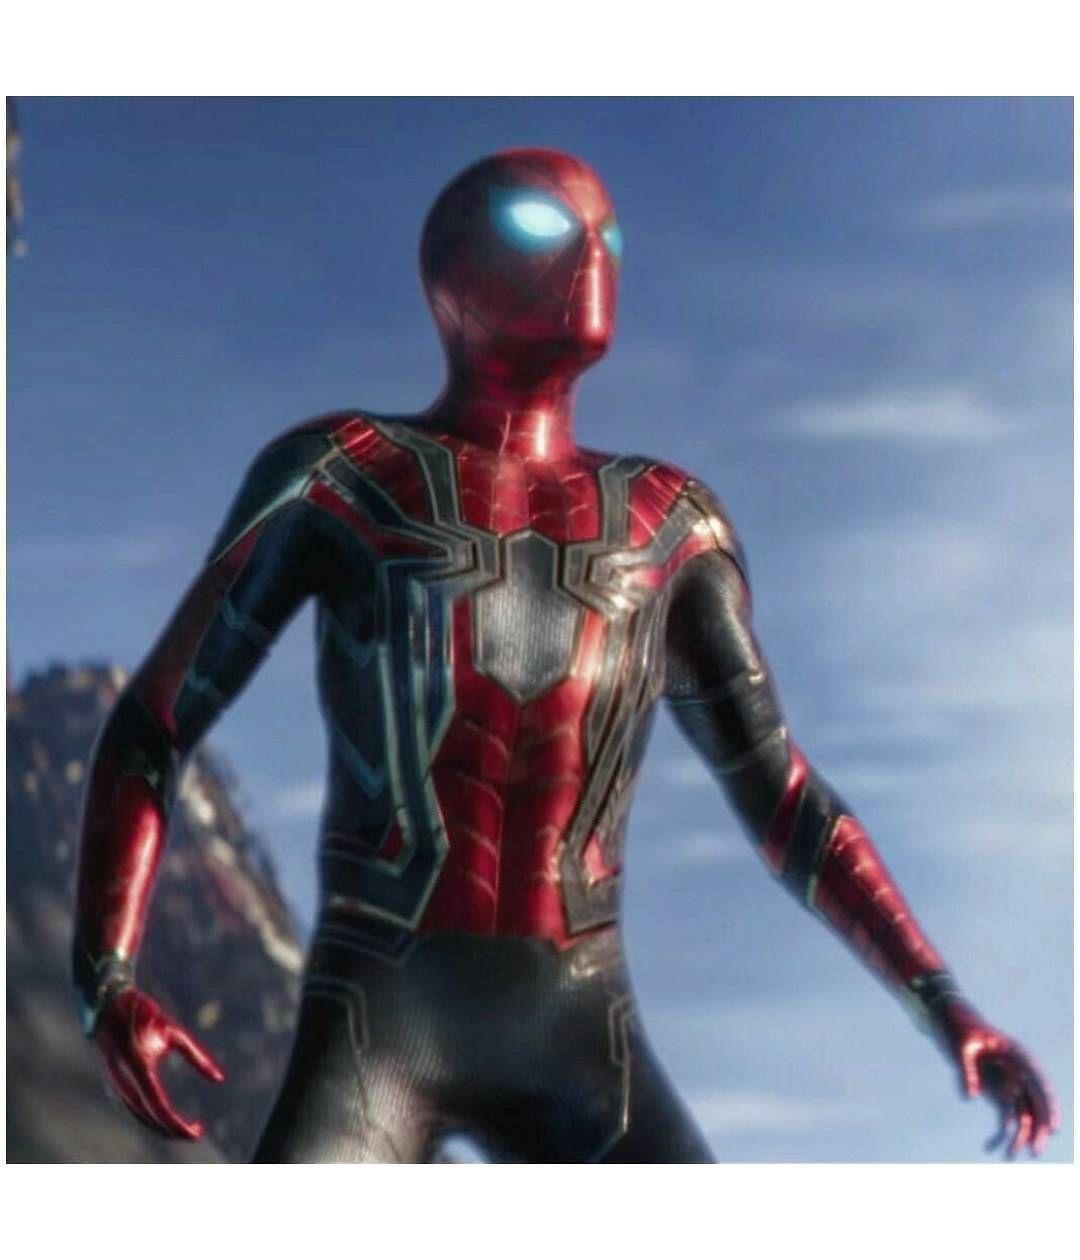 Download wallpapers 4k, Avengers Infinity War, Spiderman, 2018 movie .